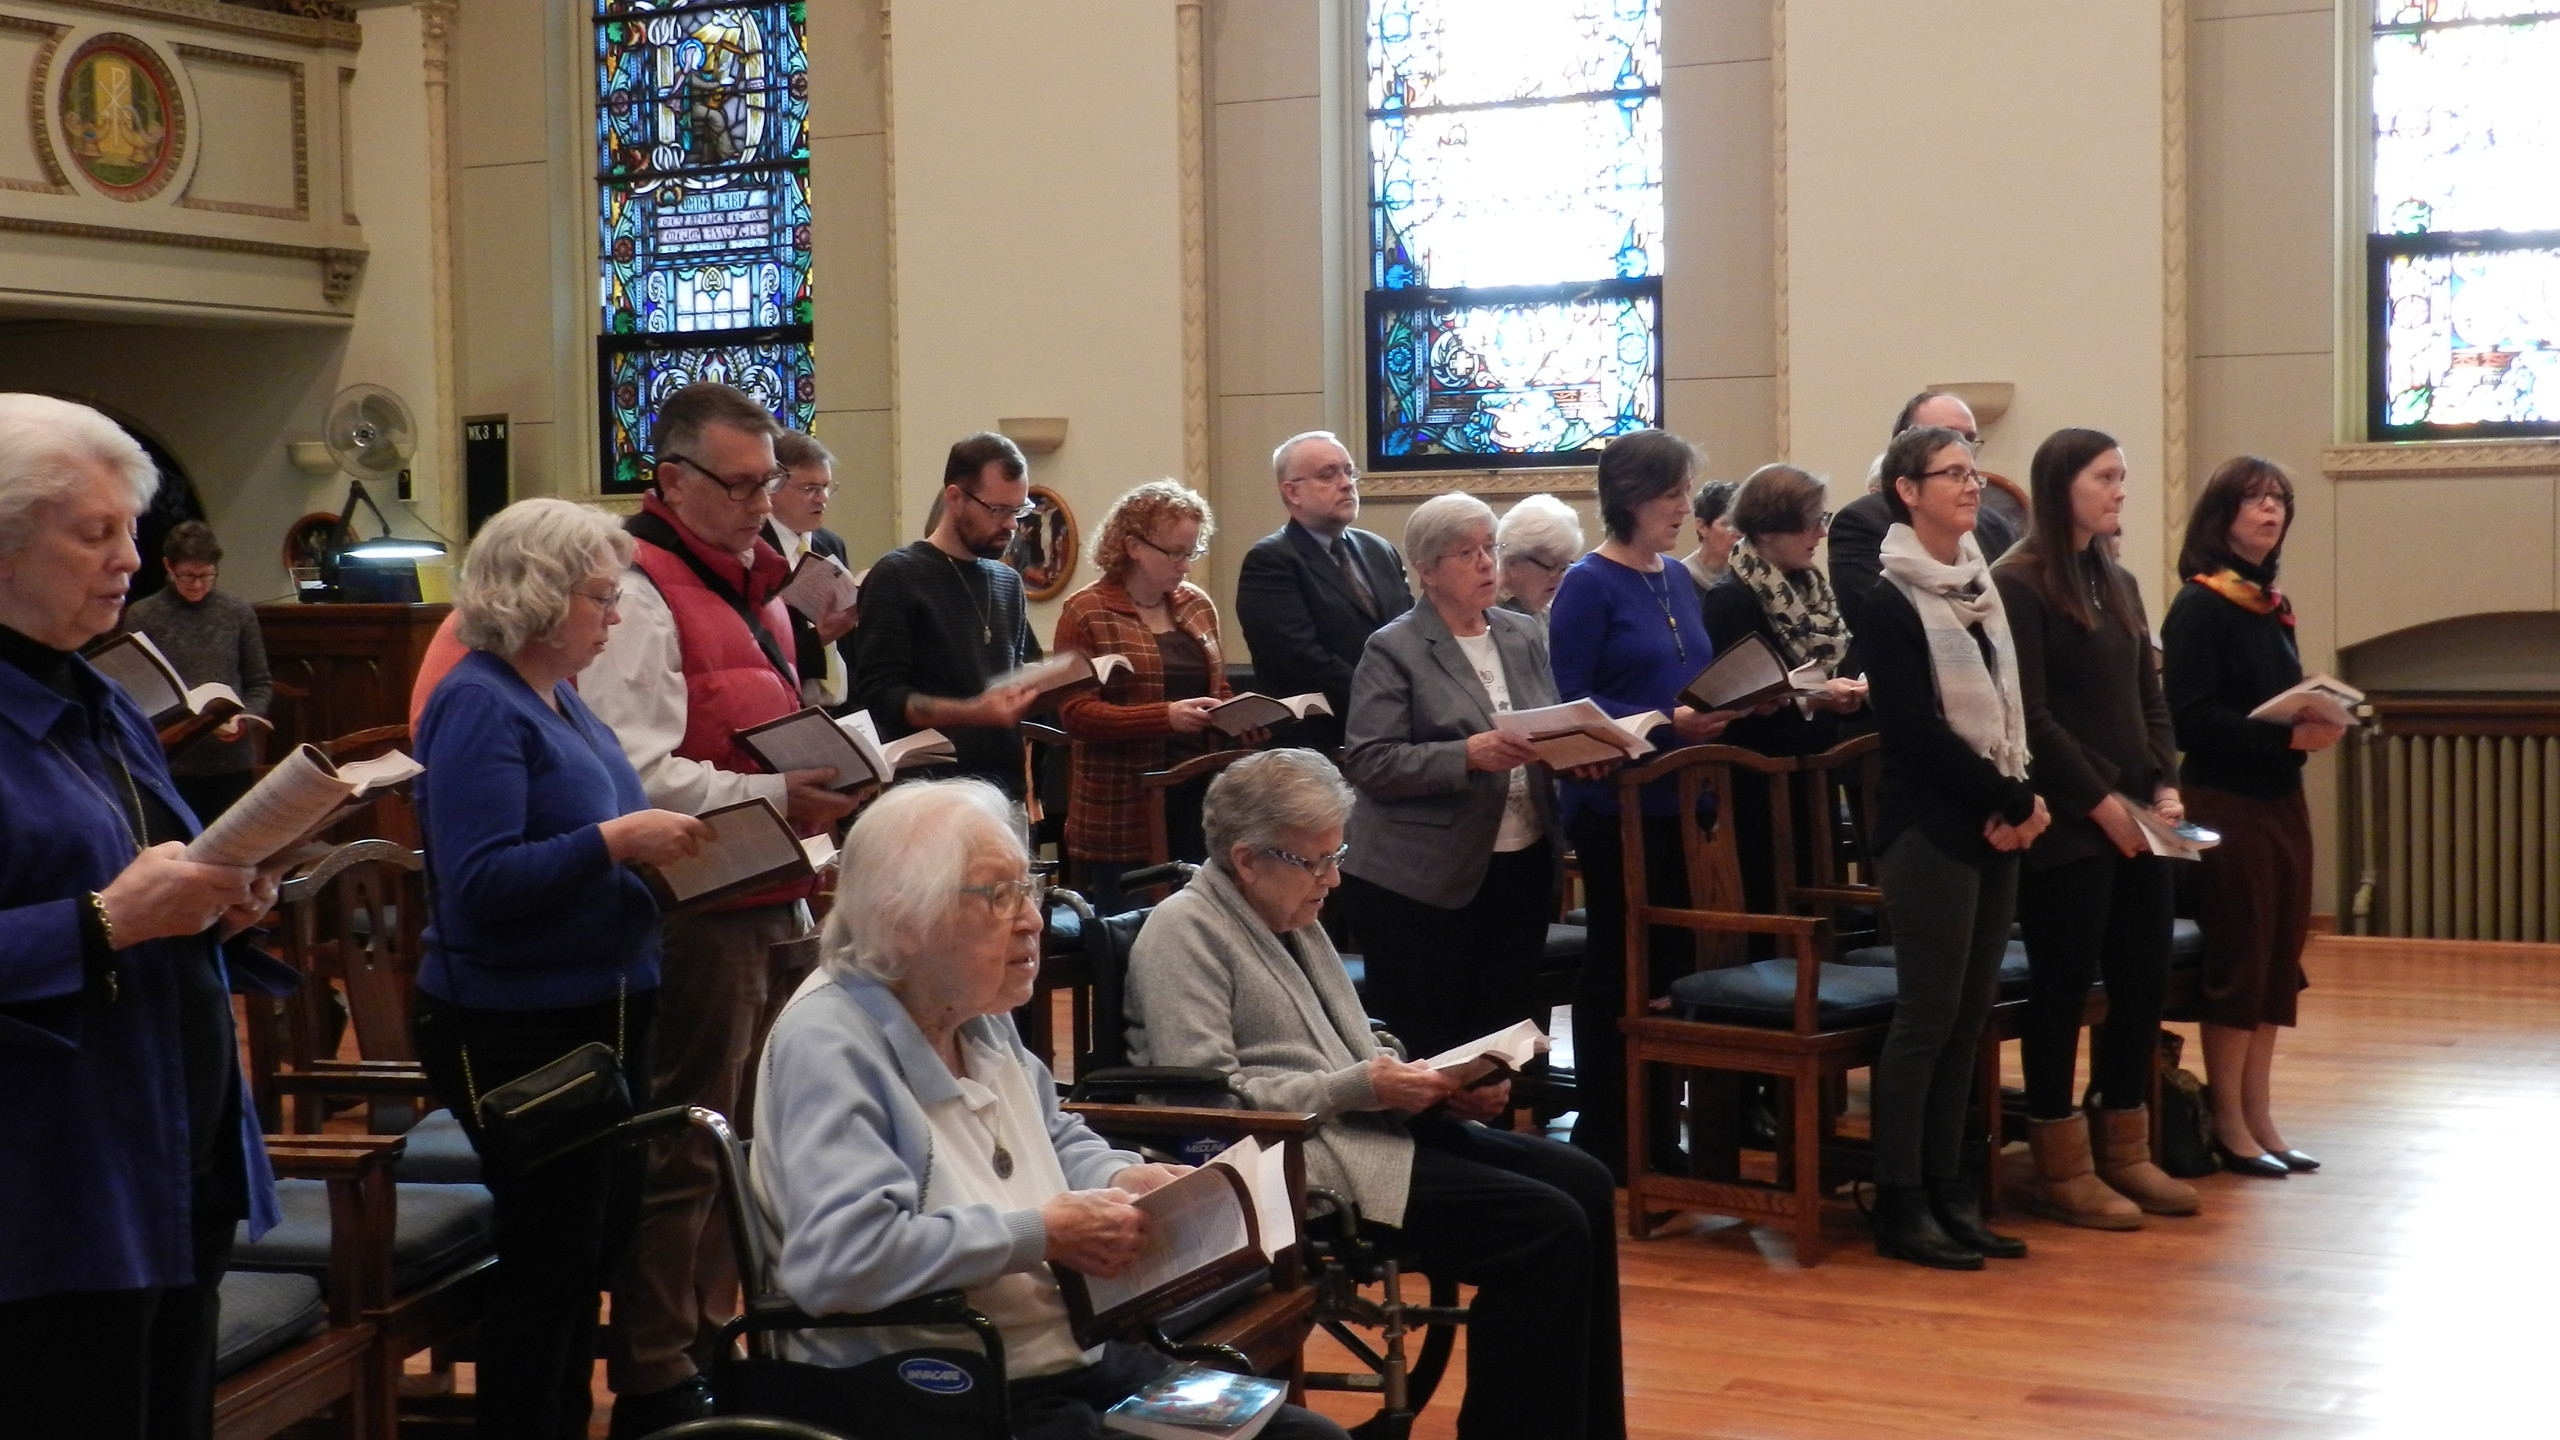 Nov. 11 Eucharistic Litrugy